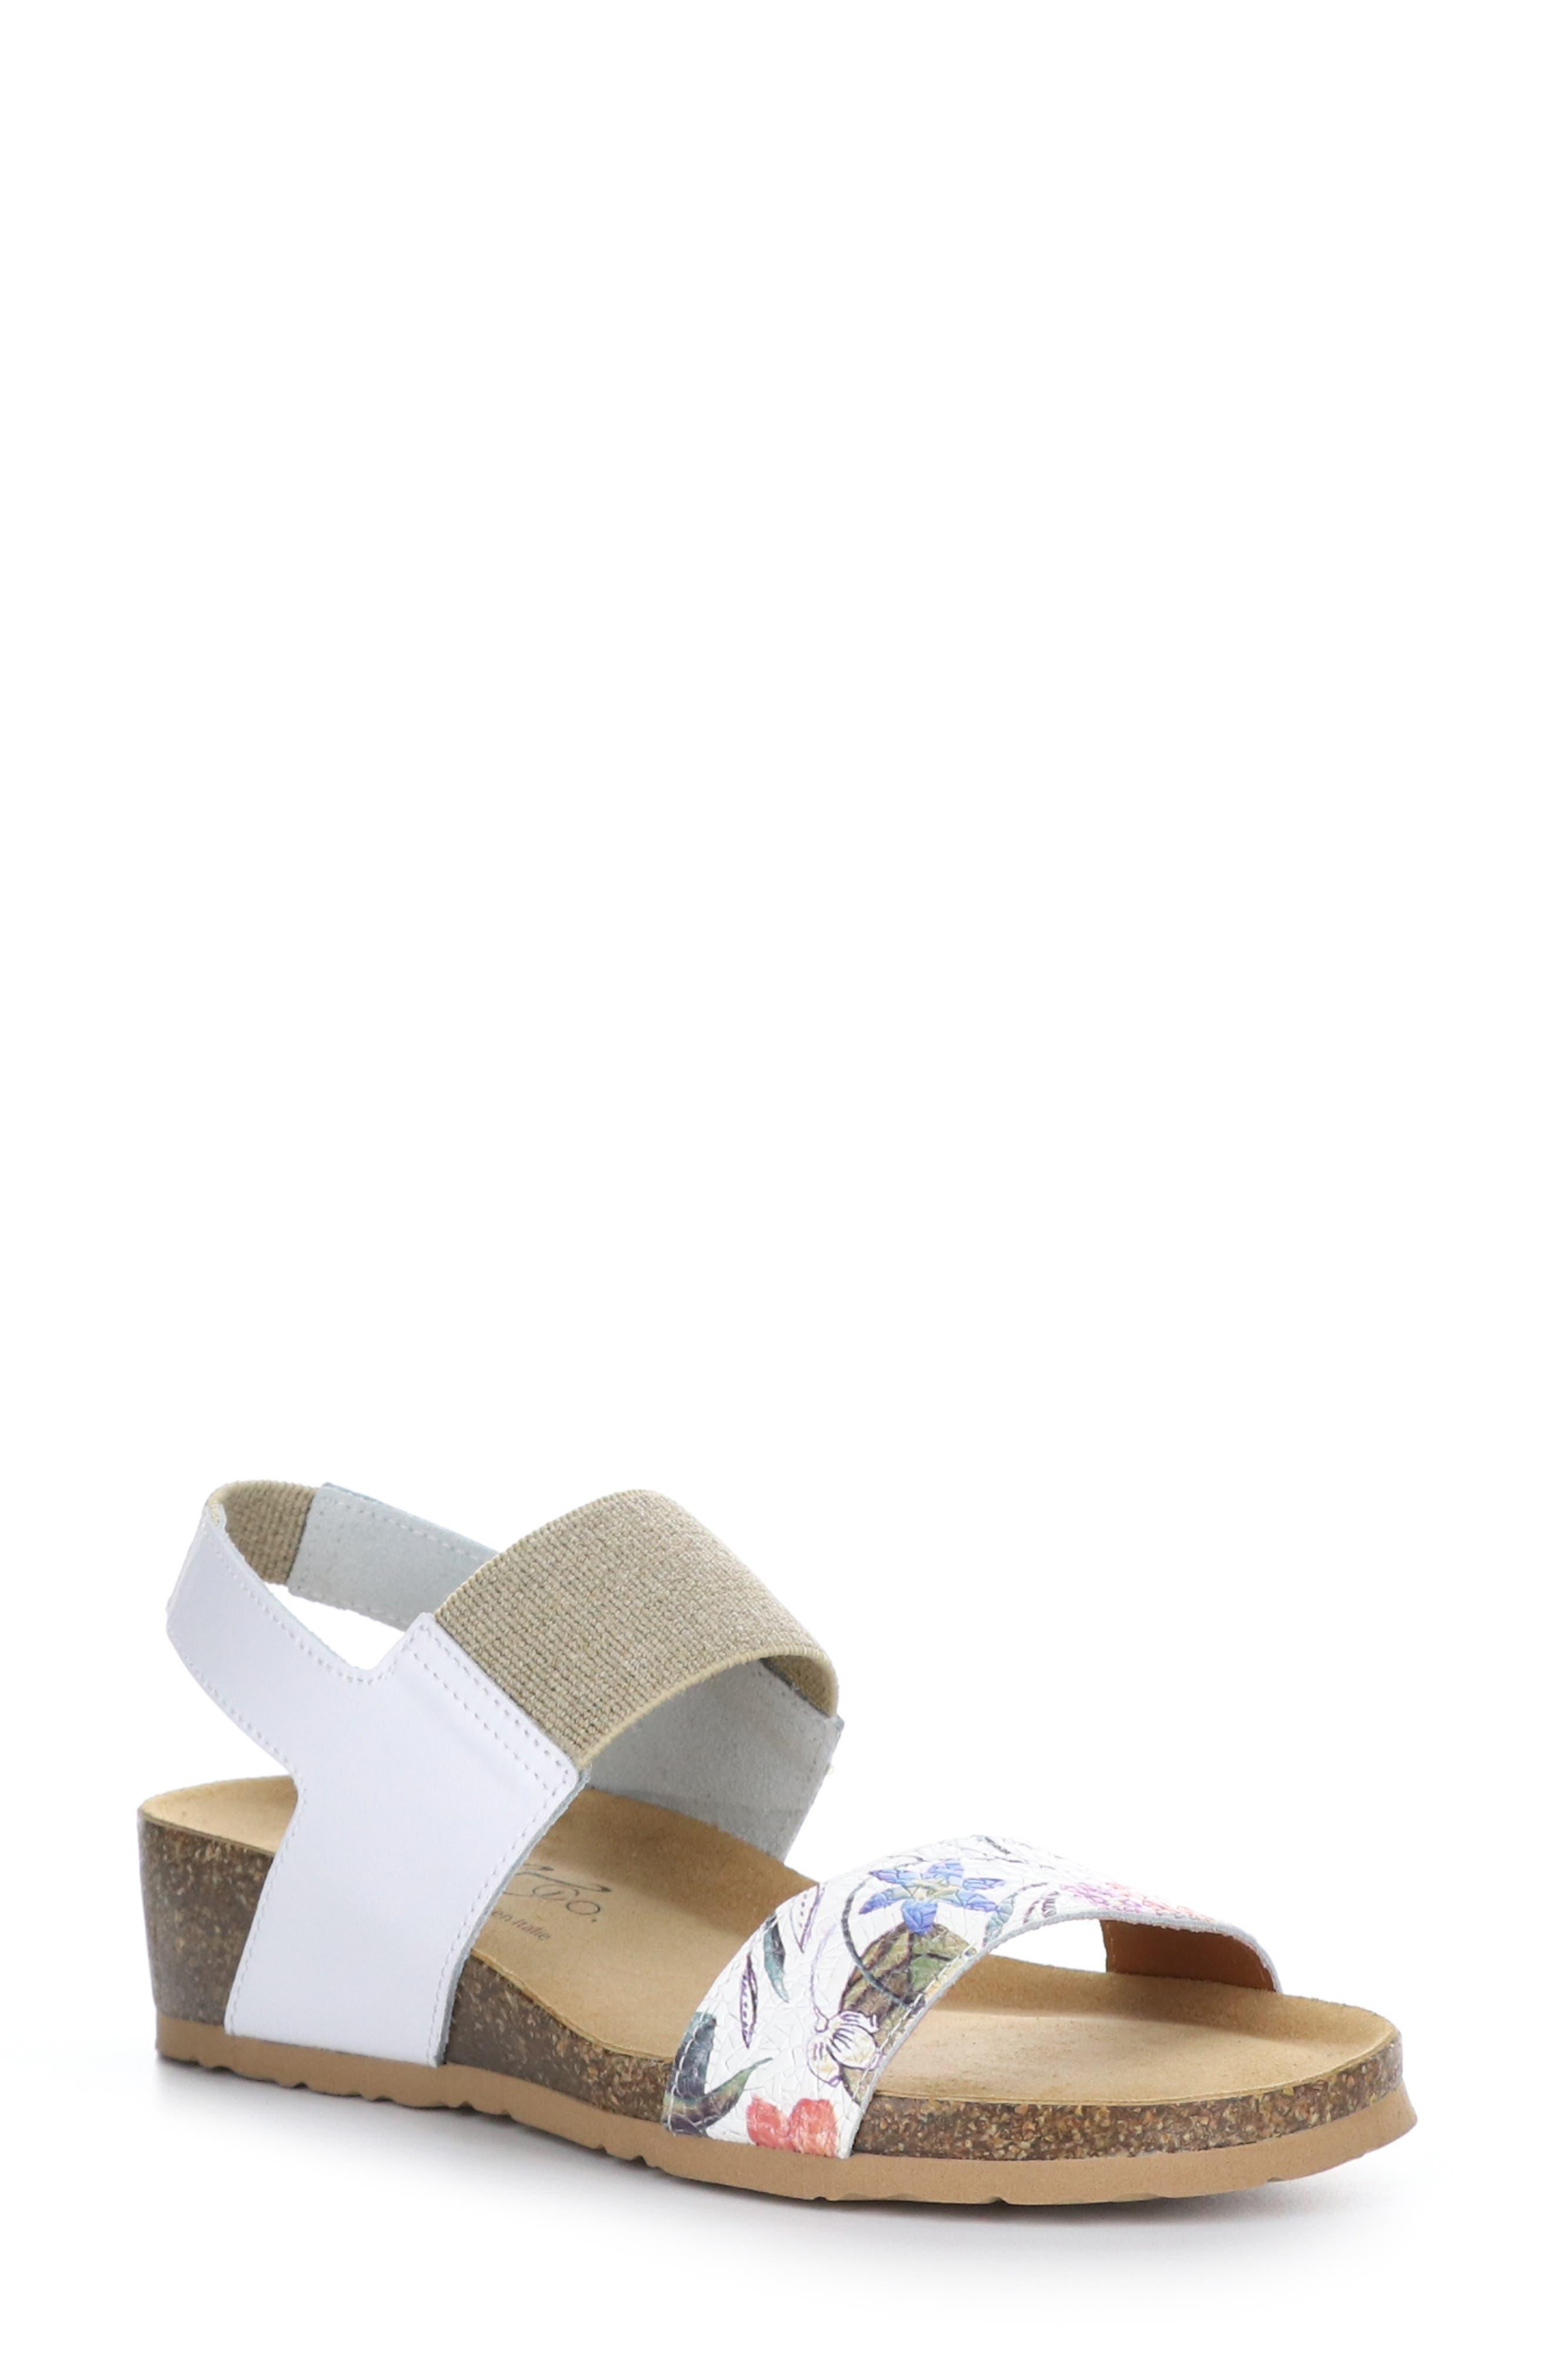 Lazio Wedge Sandal